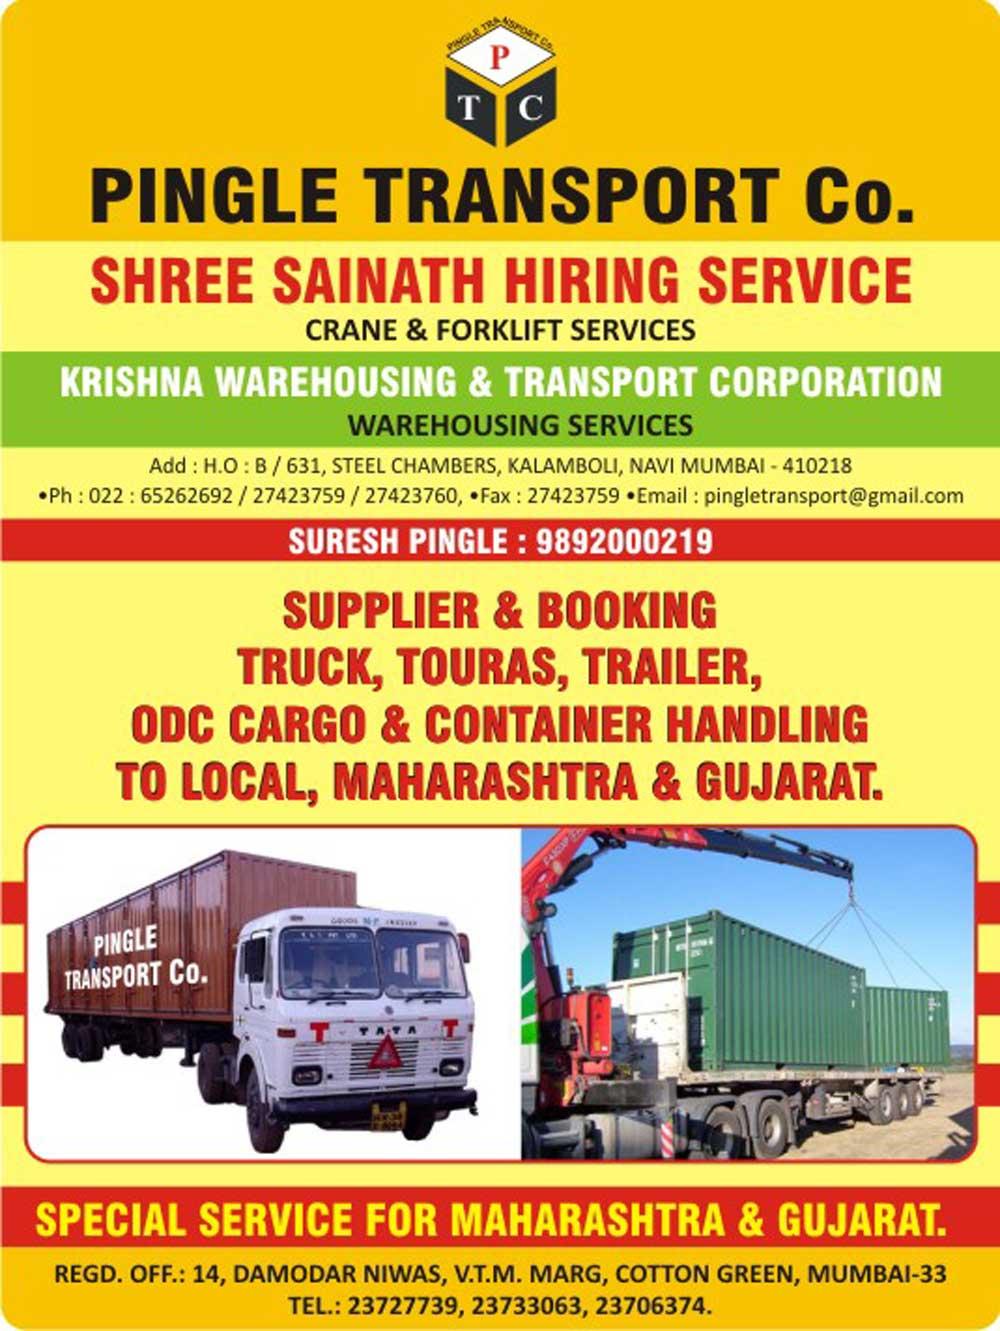 Pingle Transport Co